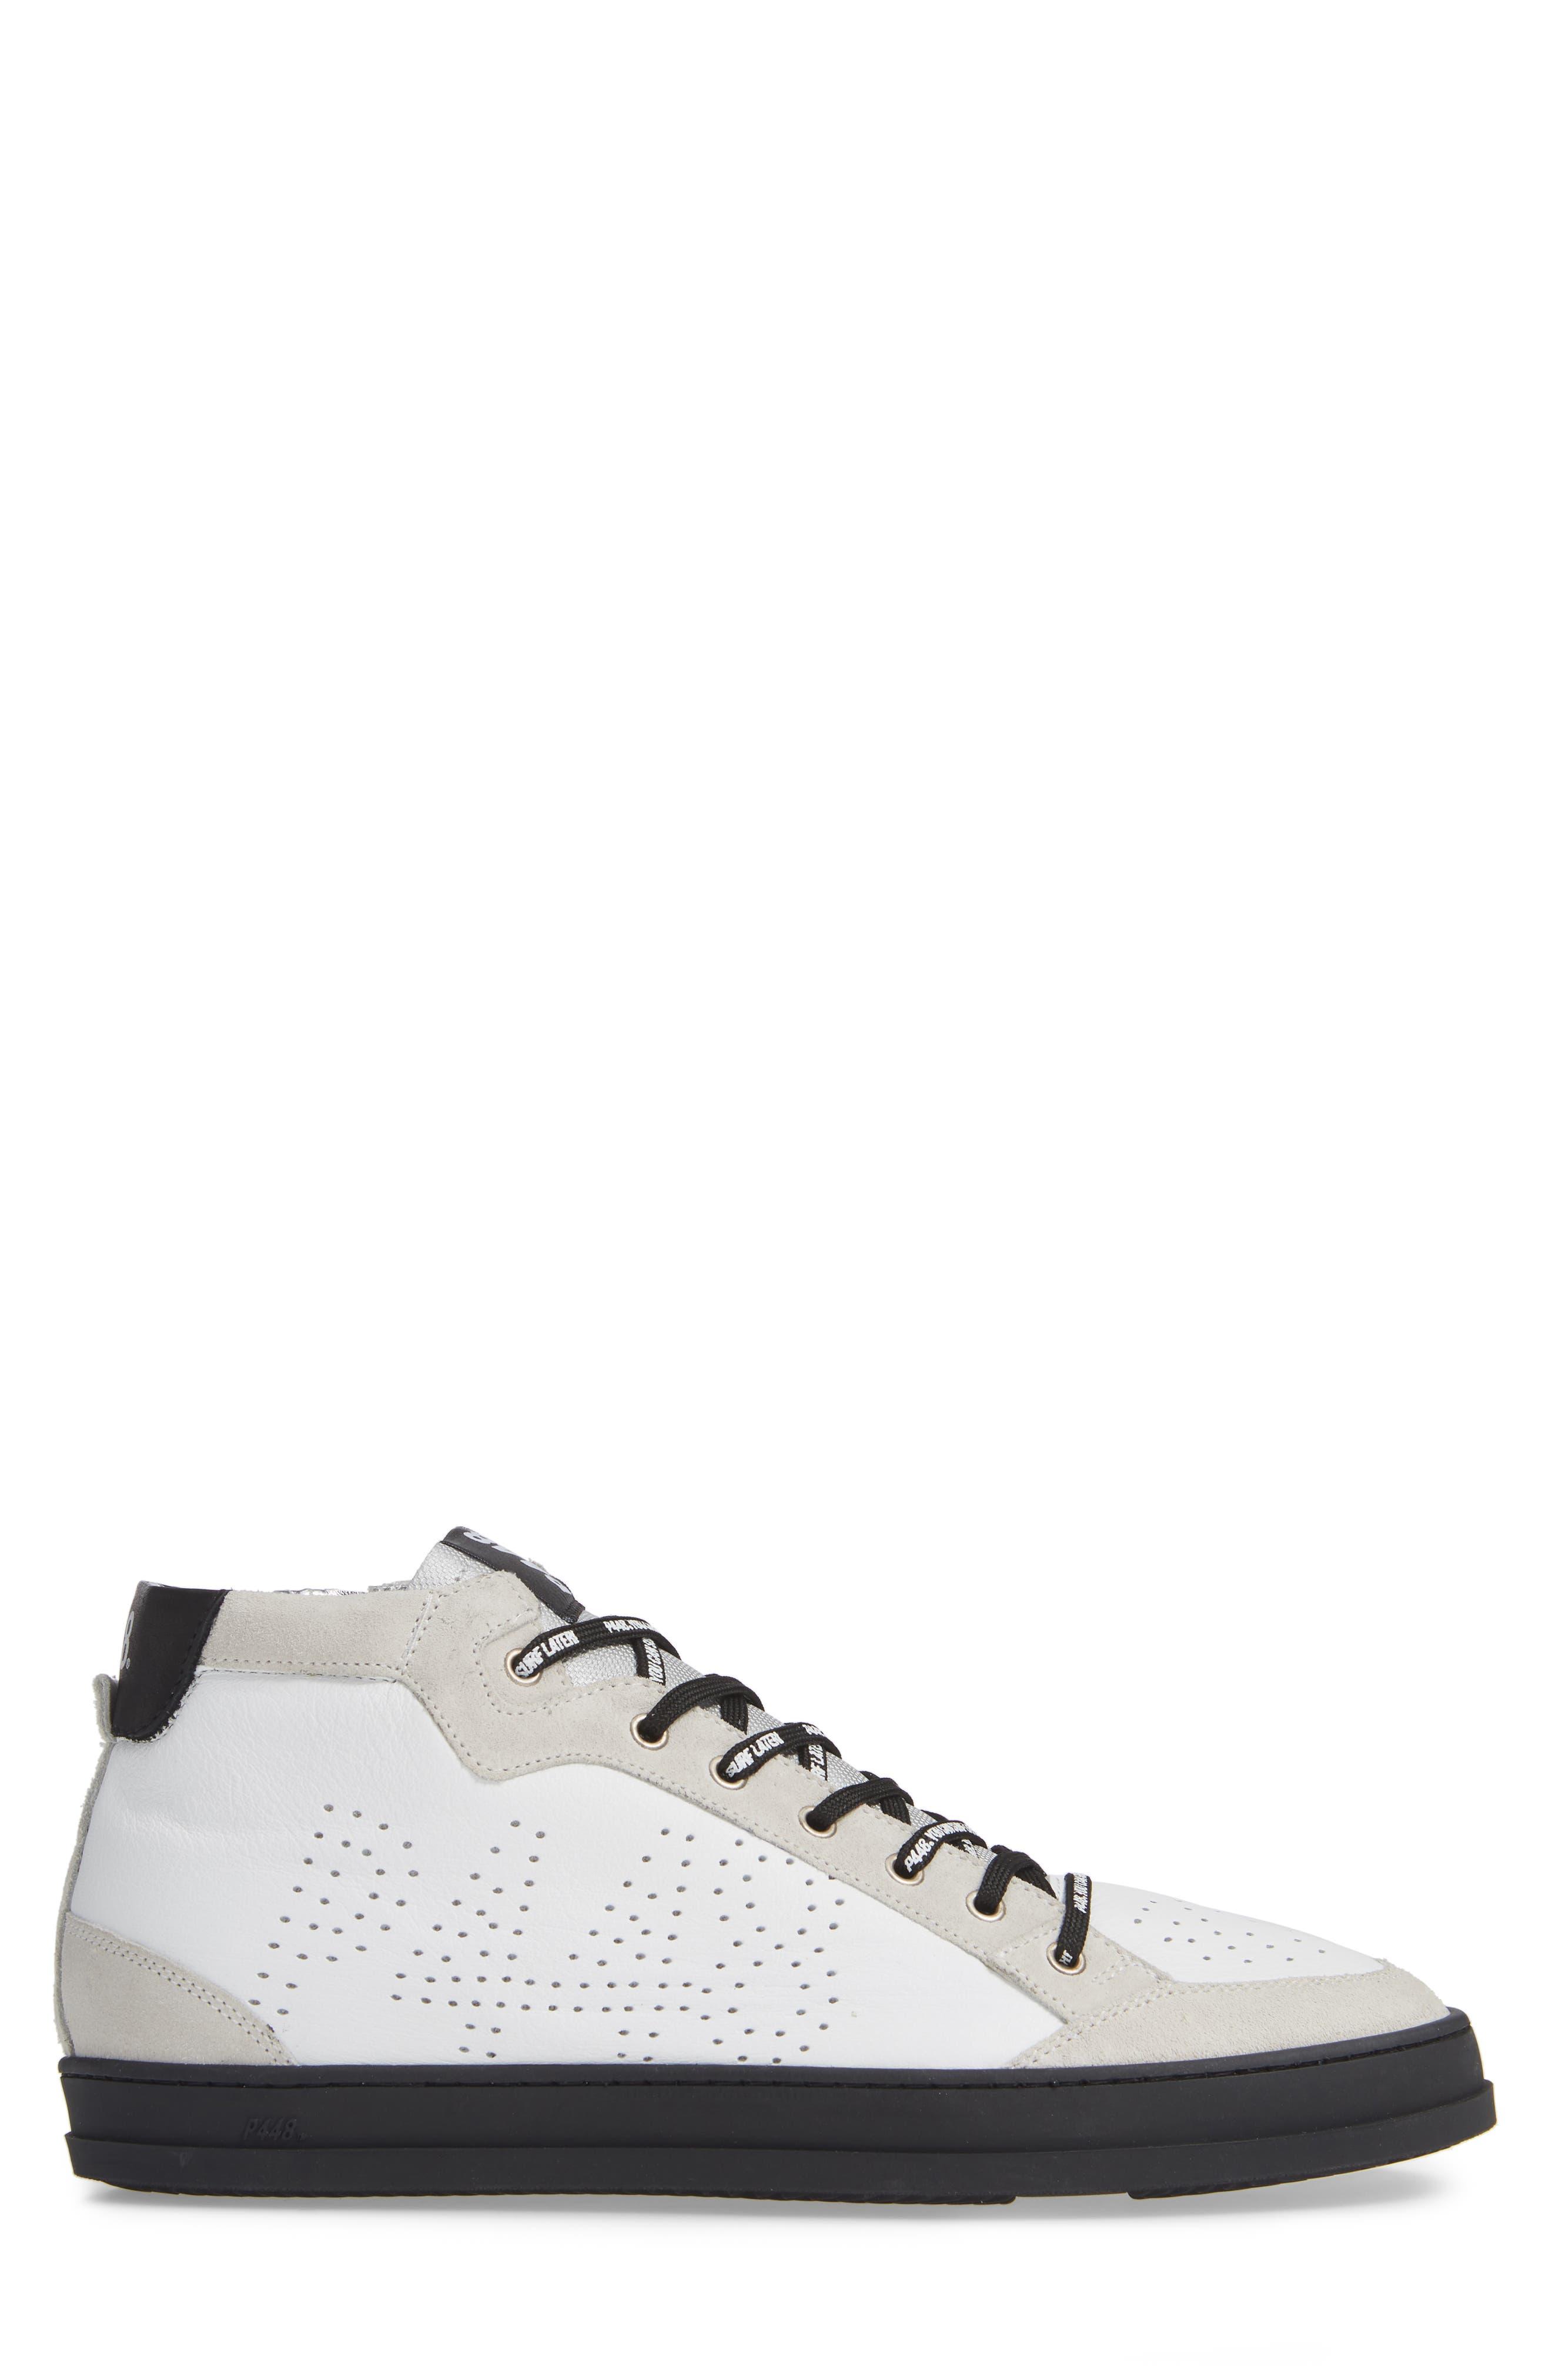 A8Love Mid Top Sneaker,                             Alternate thumbnail 3, color,                             WHITE/ BLACK